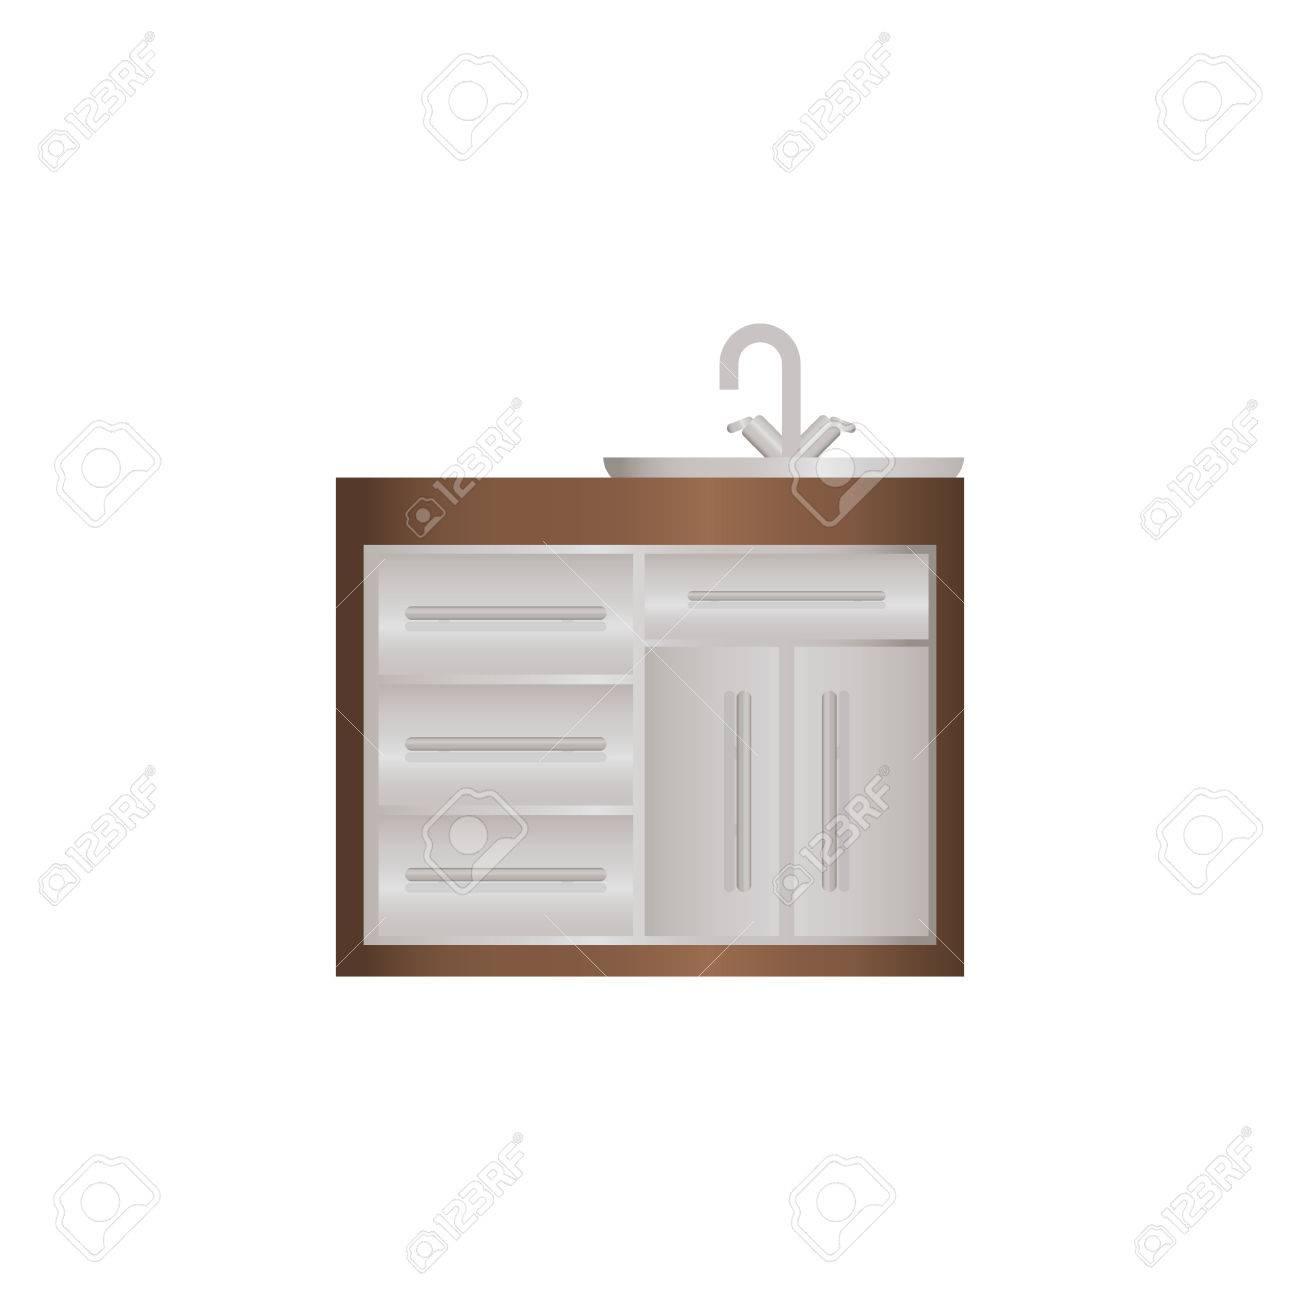 Kitchen Cabinet Icon.. Kitchen Cabinets Full-wall, Kitchen Design ...